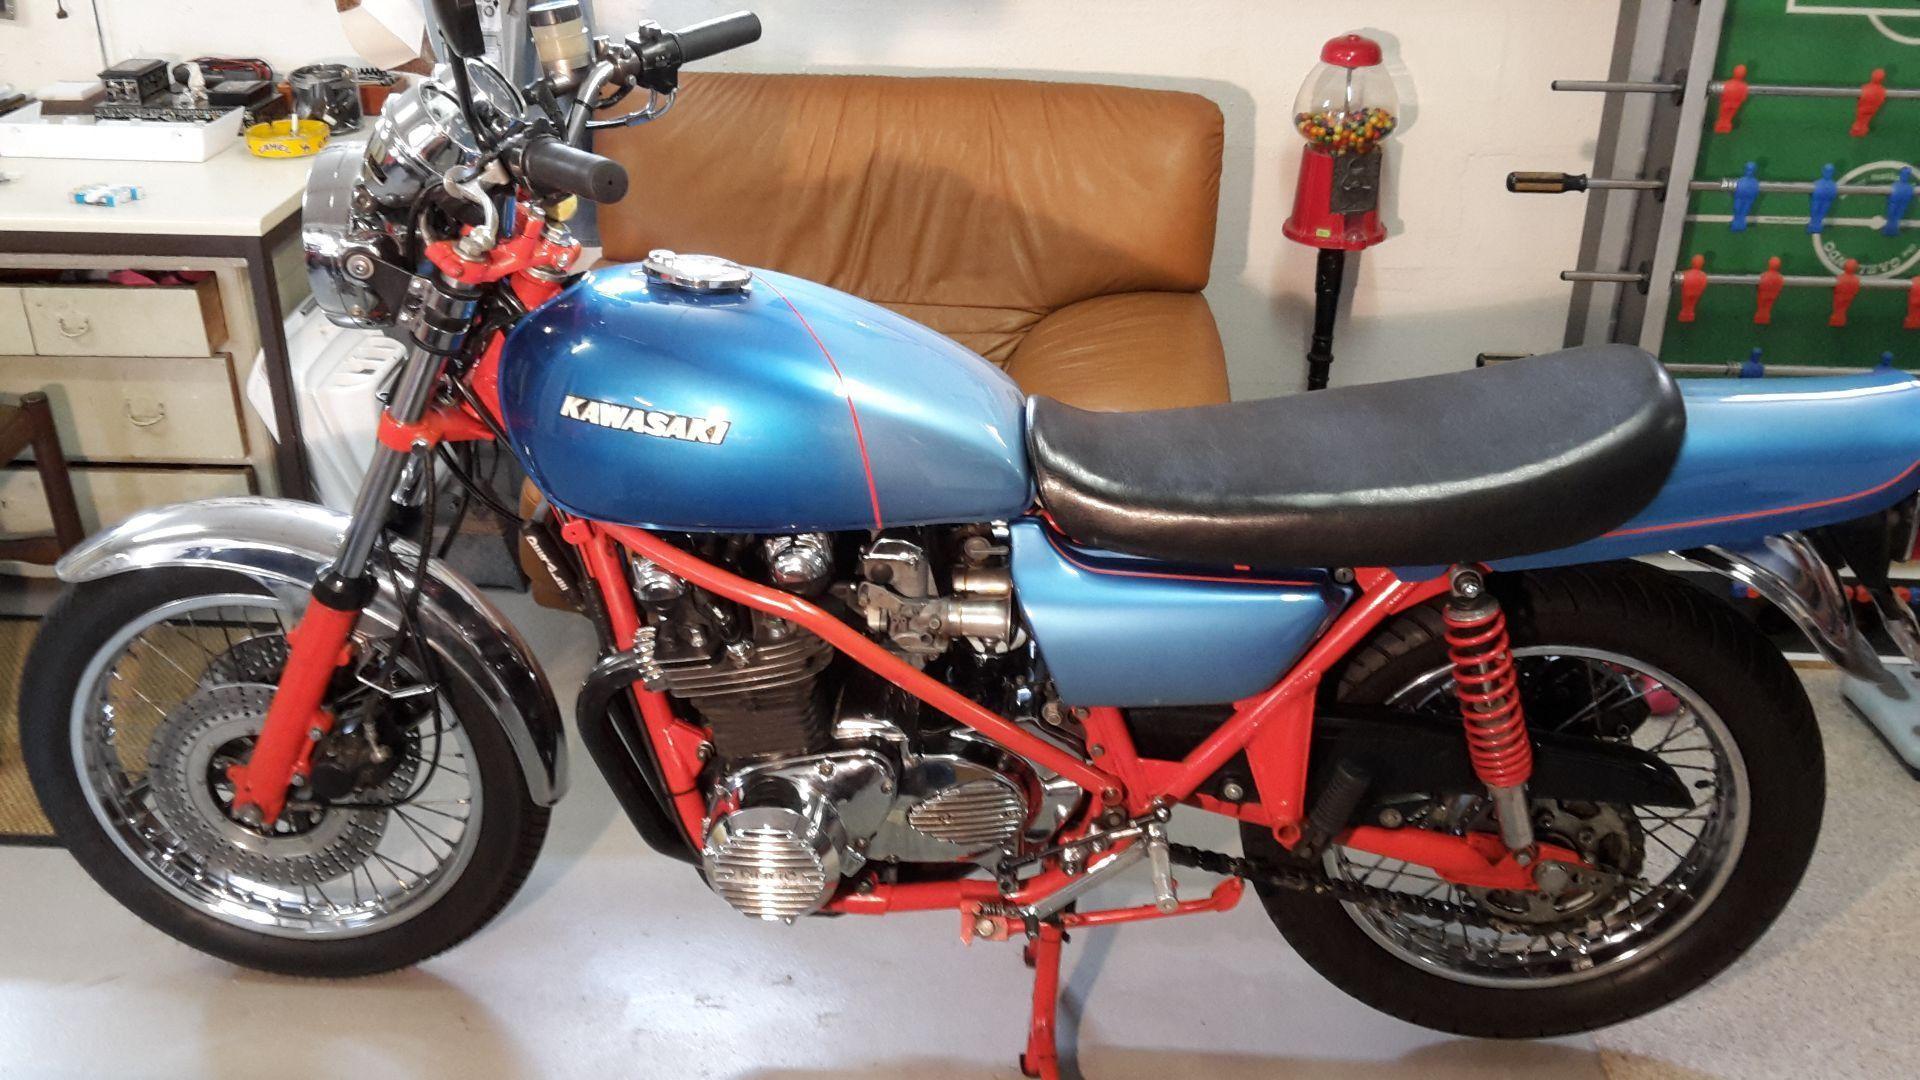 motorrad oldtimer kaufen kawasaki z1000 moto center karle. Black Bedroom Furniture Sets. Home Design Ideas